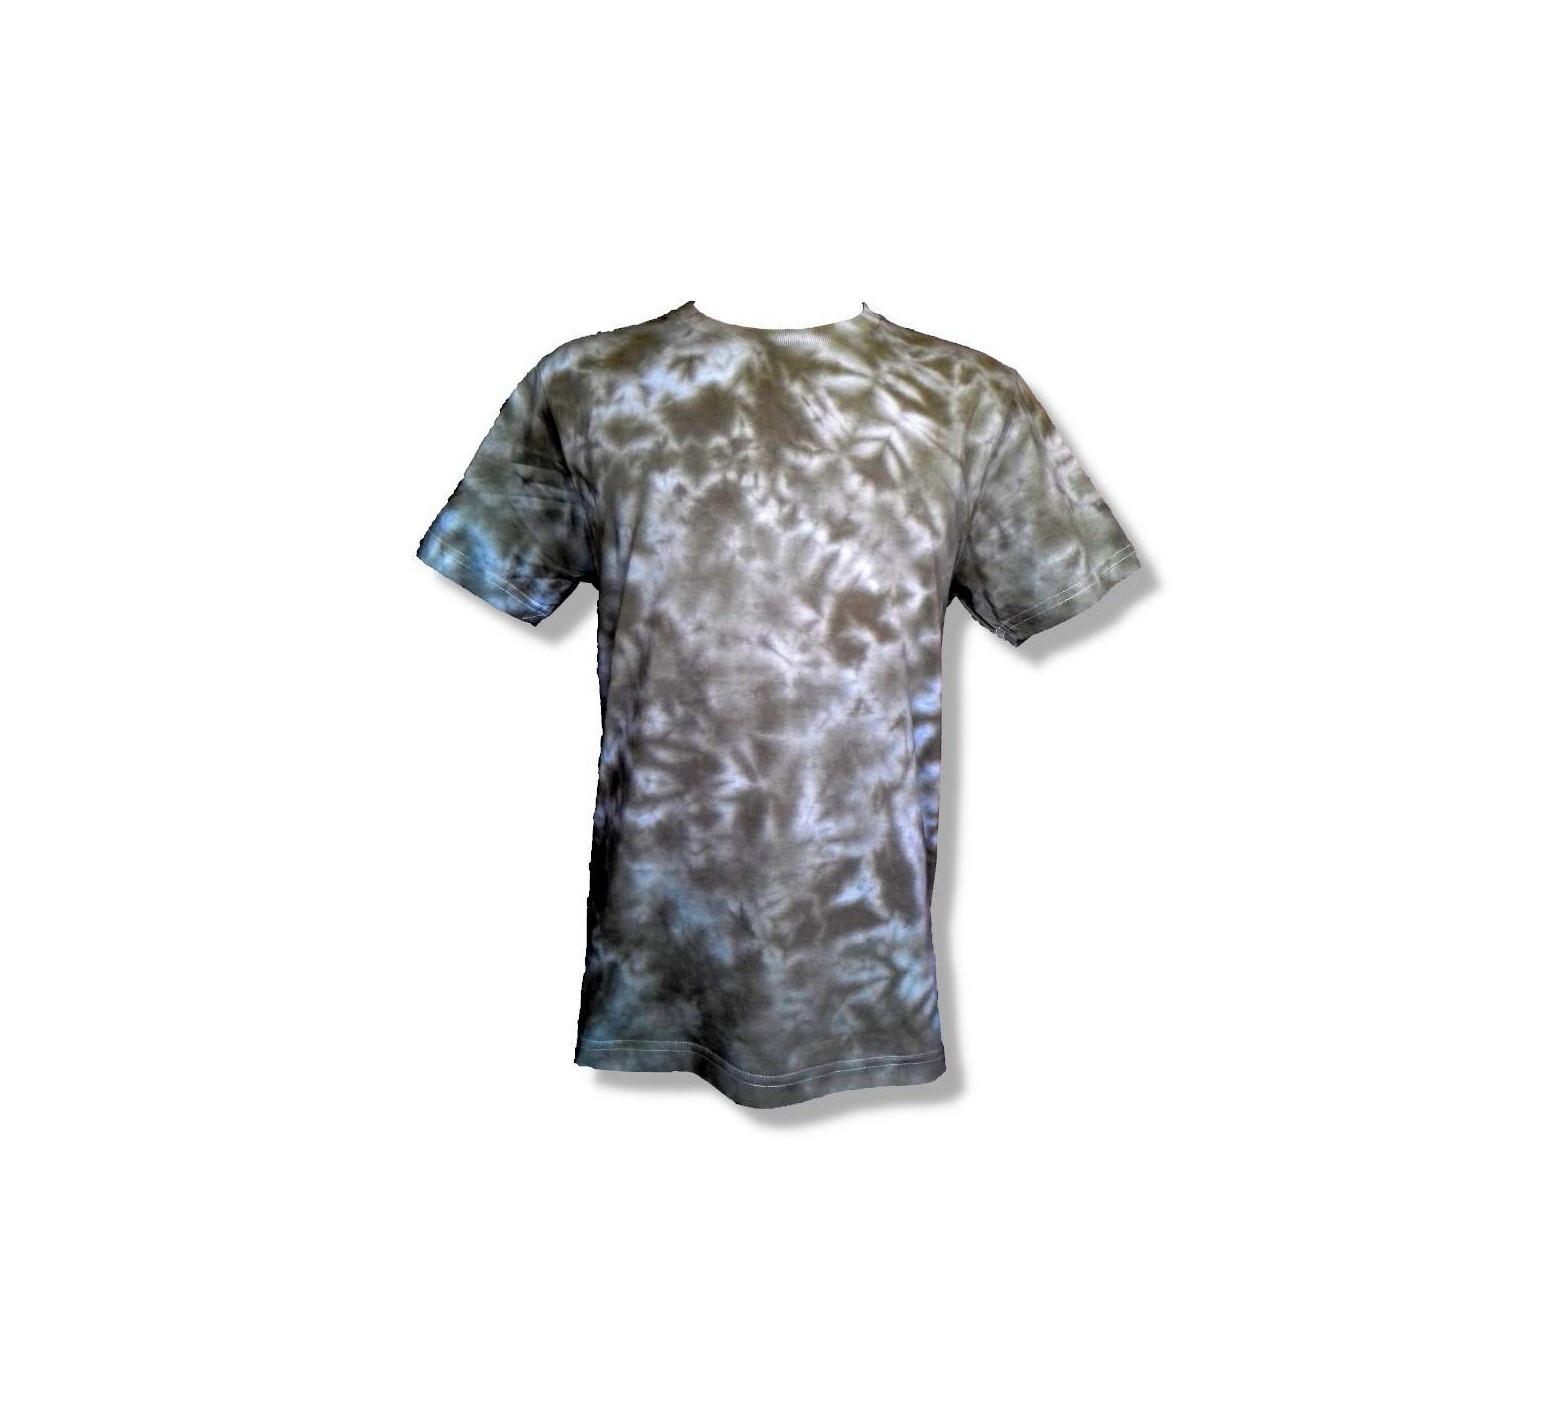 b2e4a13e51 Camiseta Tie Dye Masculina